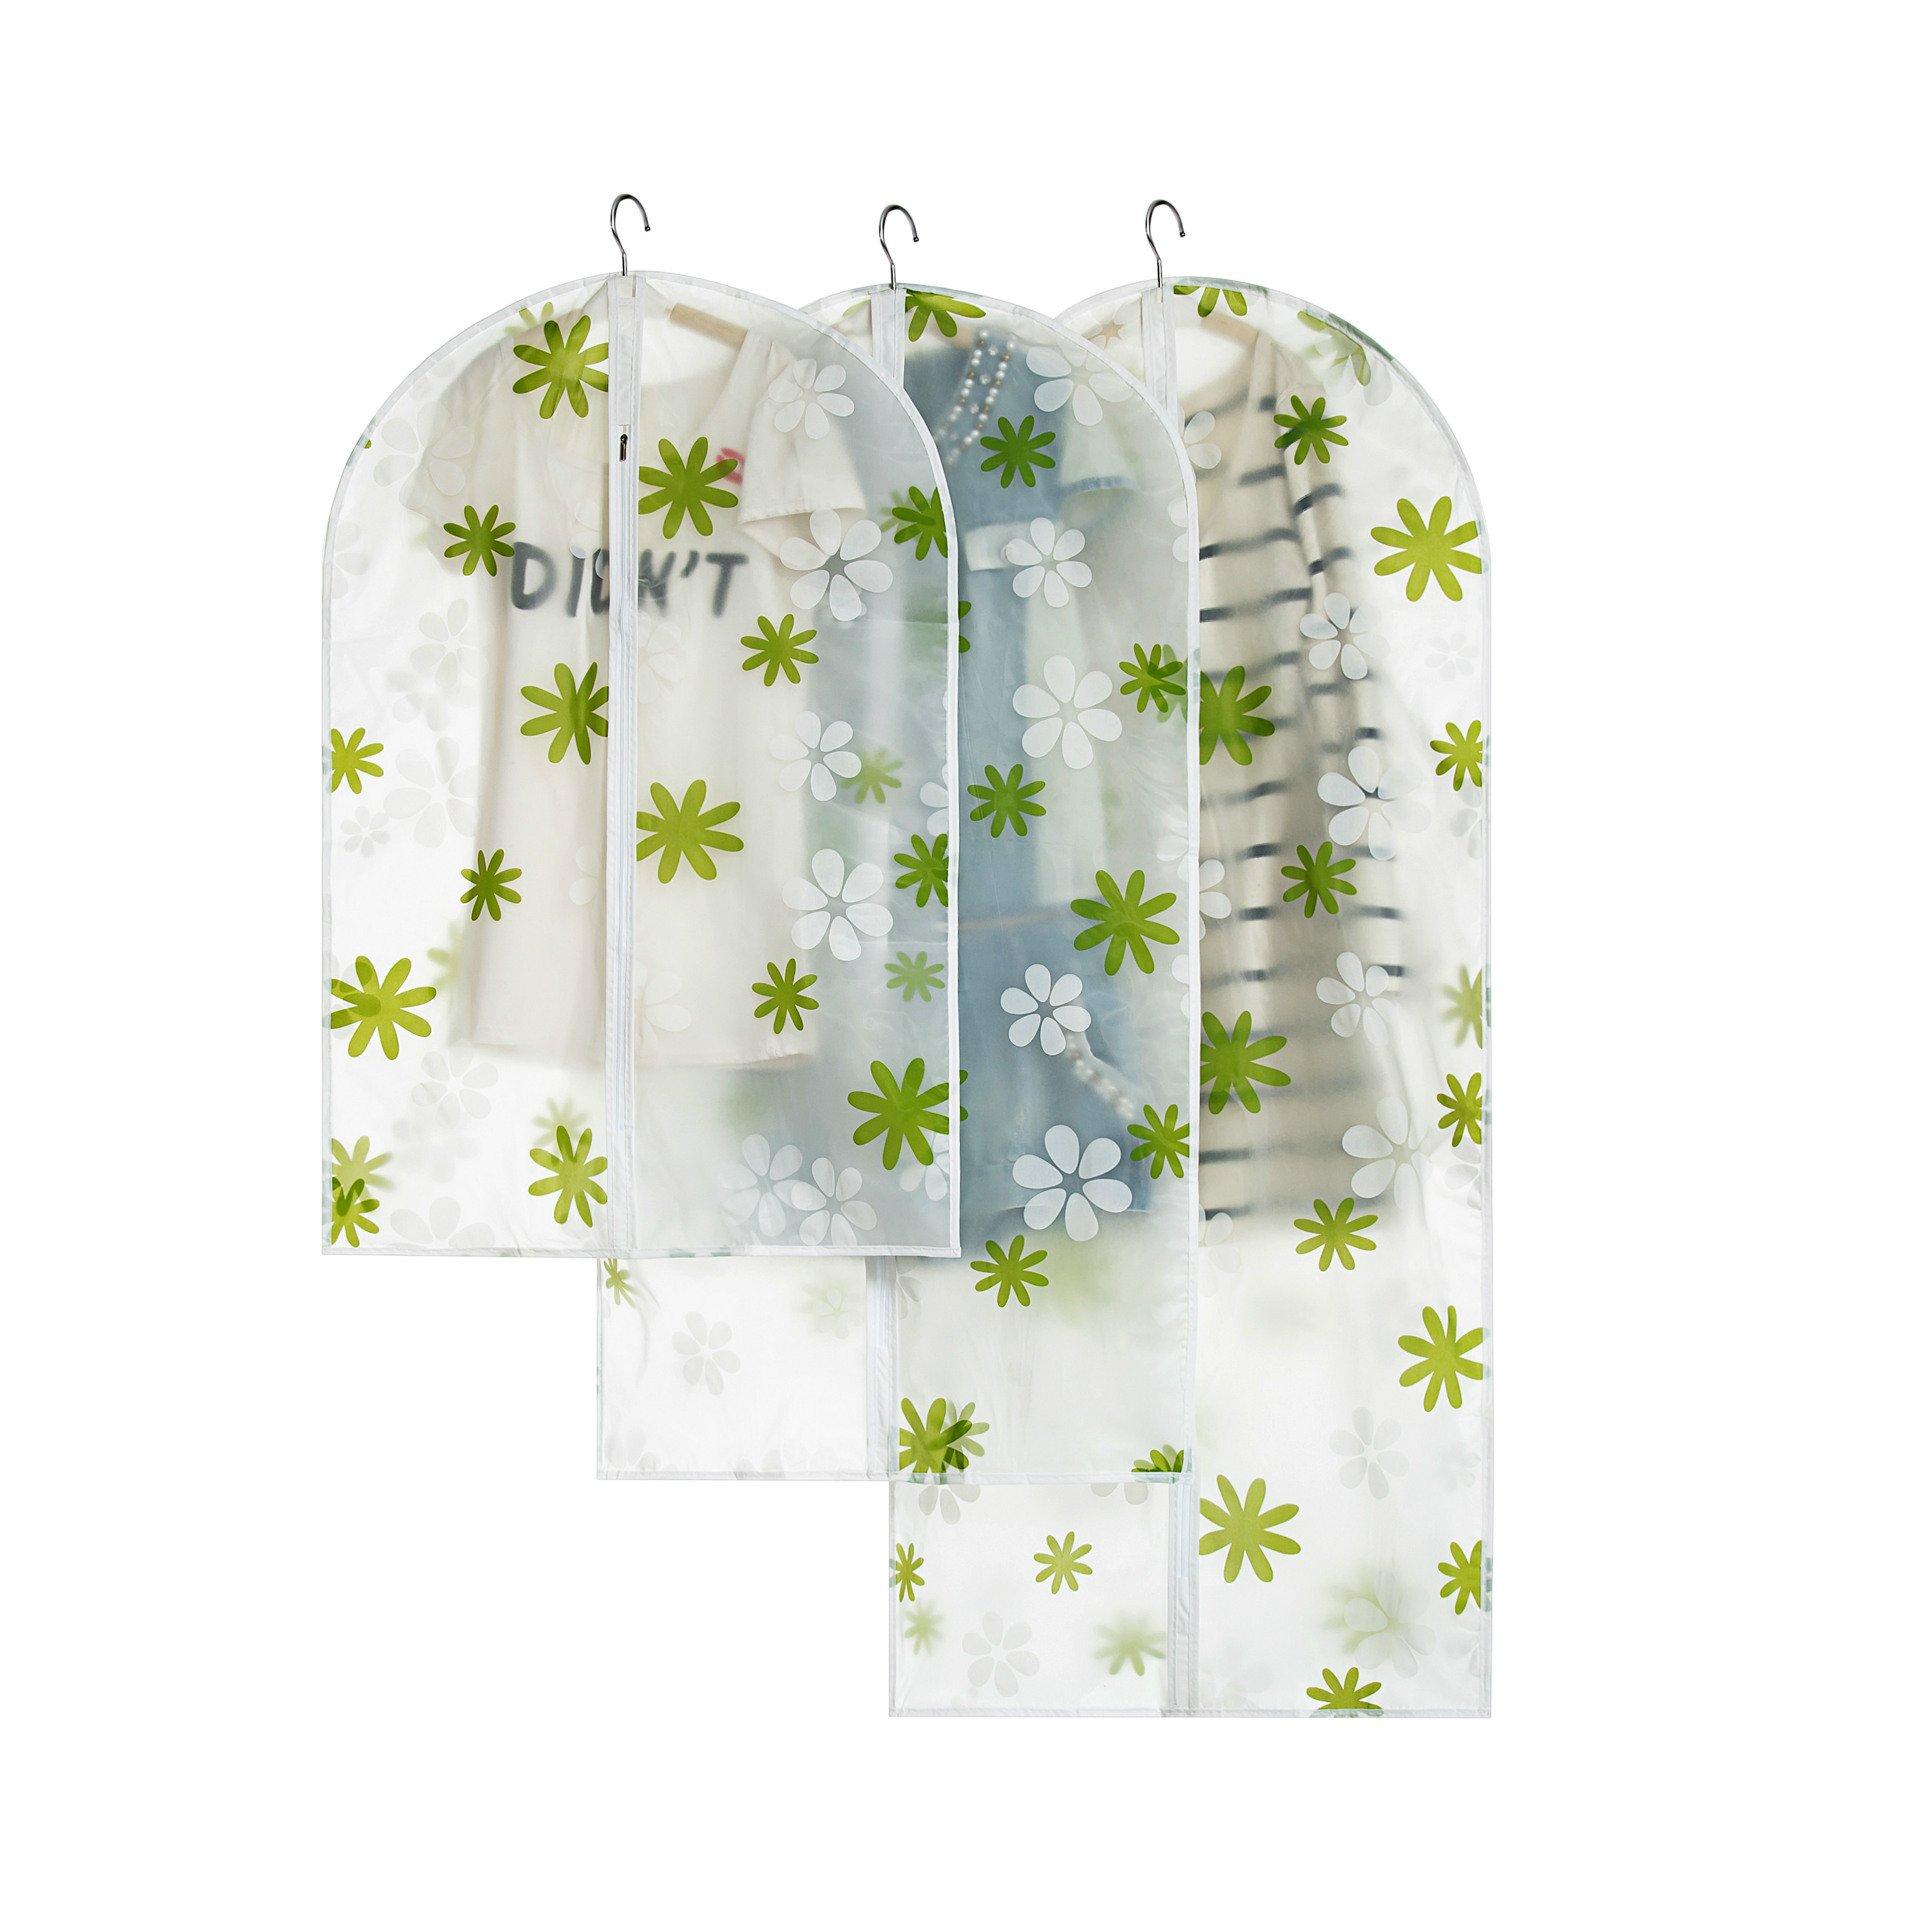 OHOO 6pcs/Pack Garment Bags Dust Cover Lightweight Green Flower Clear Suit Bag Full Zipper Travel Coat Dance Dress Cloth Cover Closet Storage Three Sizes